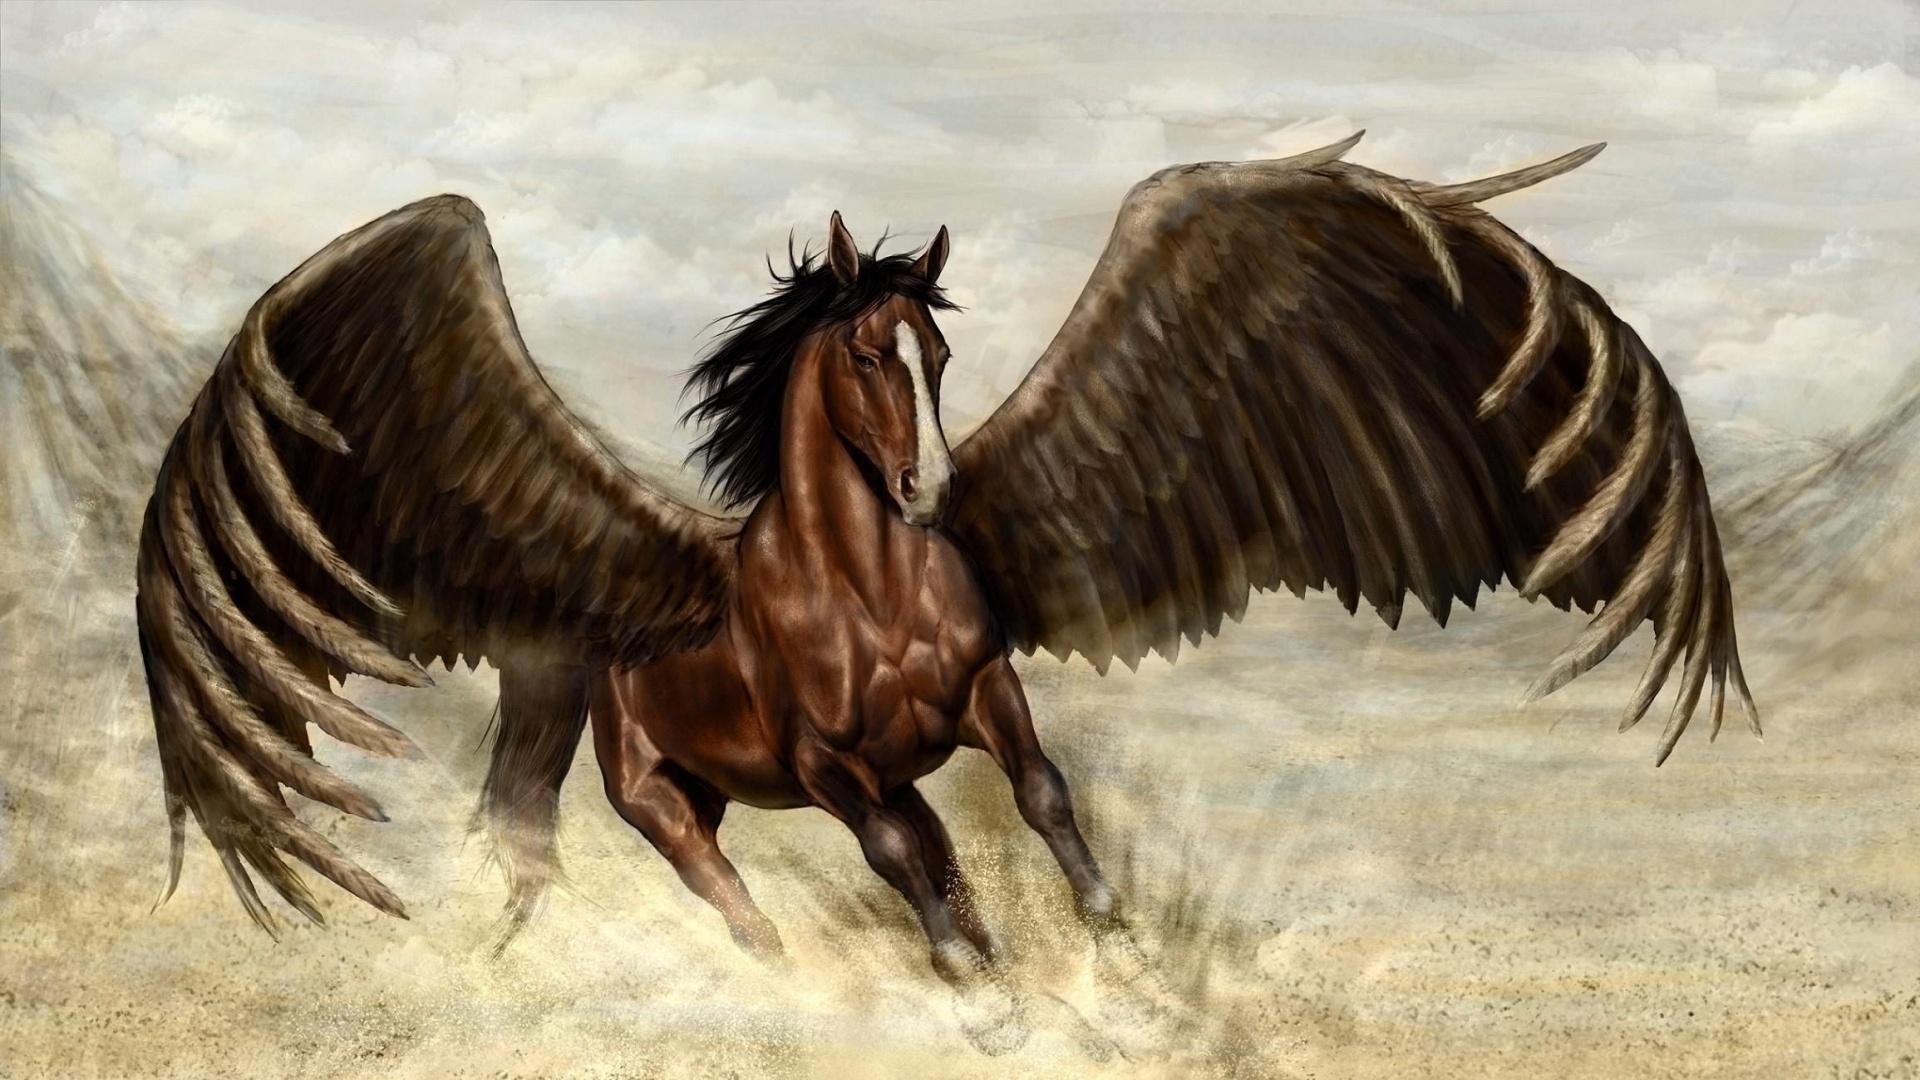 Pegasus Art Wallpaper theme